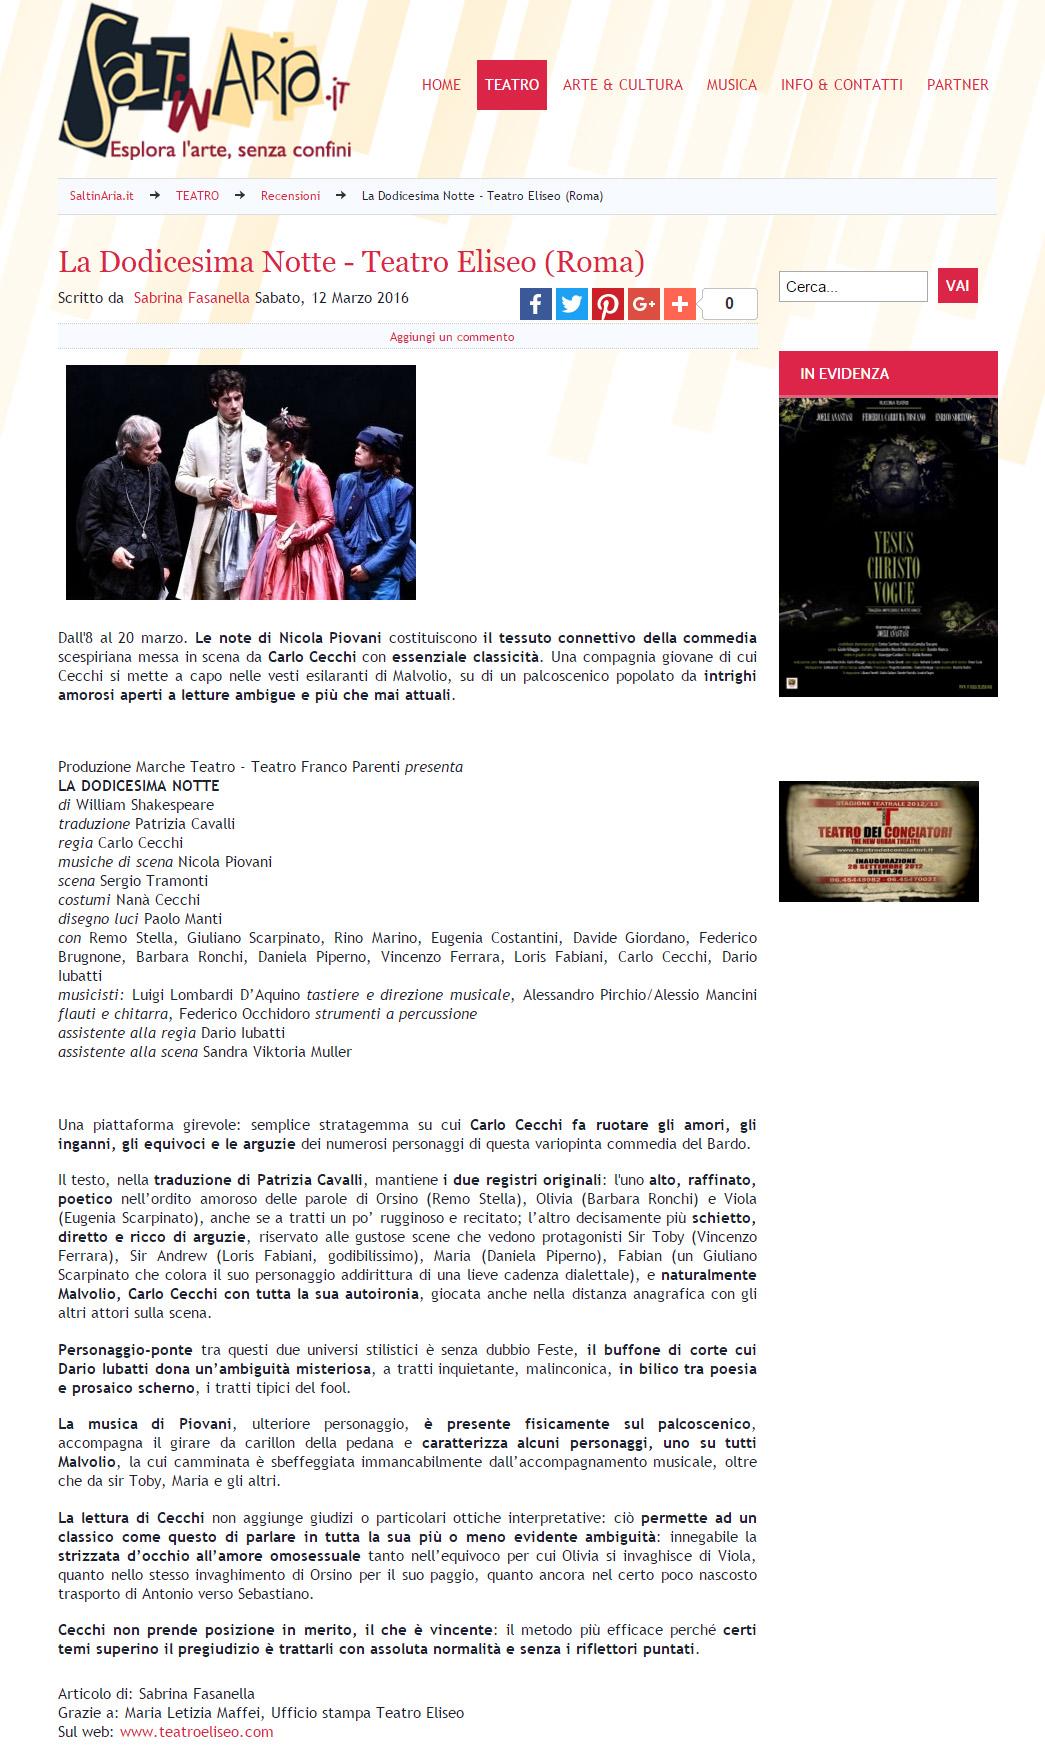 2016.03.12 La dodicesima notte, Teatro Eliseo - saltinaria.it